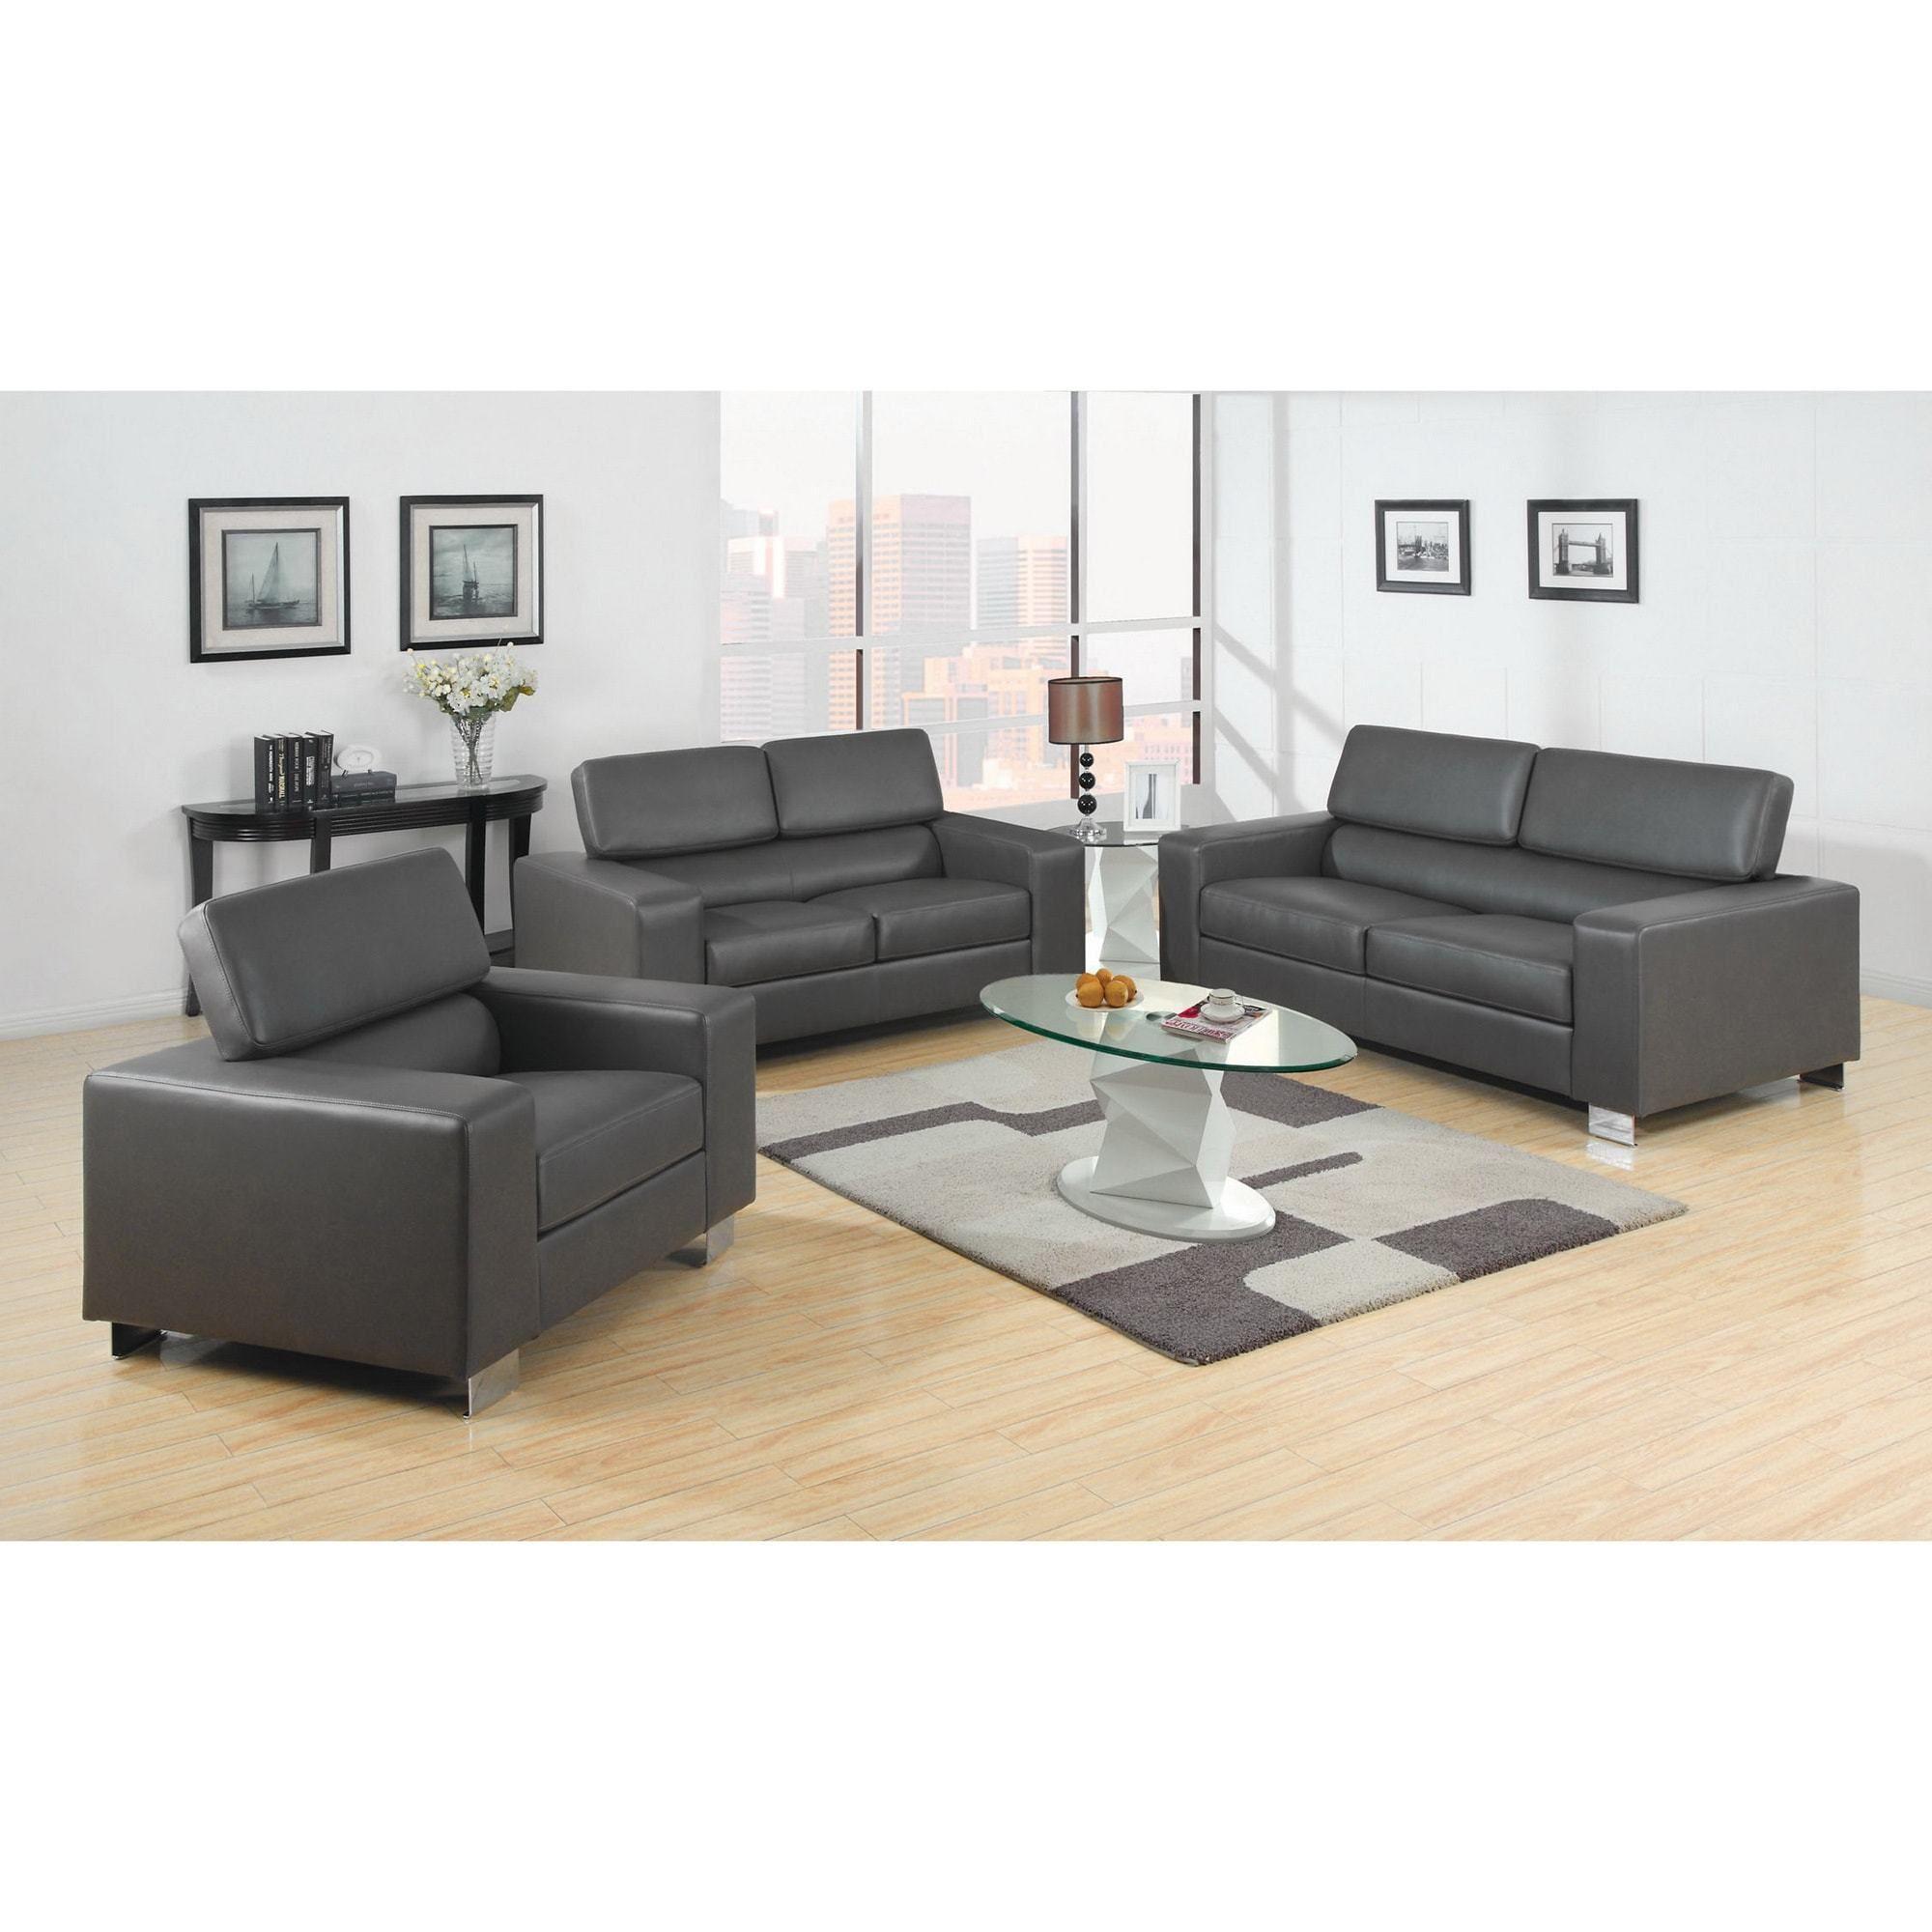 Grey Leather Sofa Sets Decorating Idea …